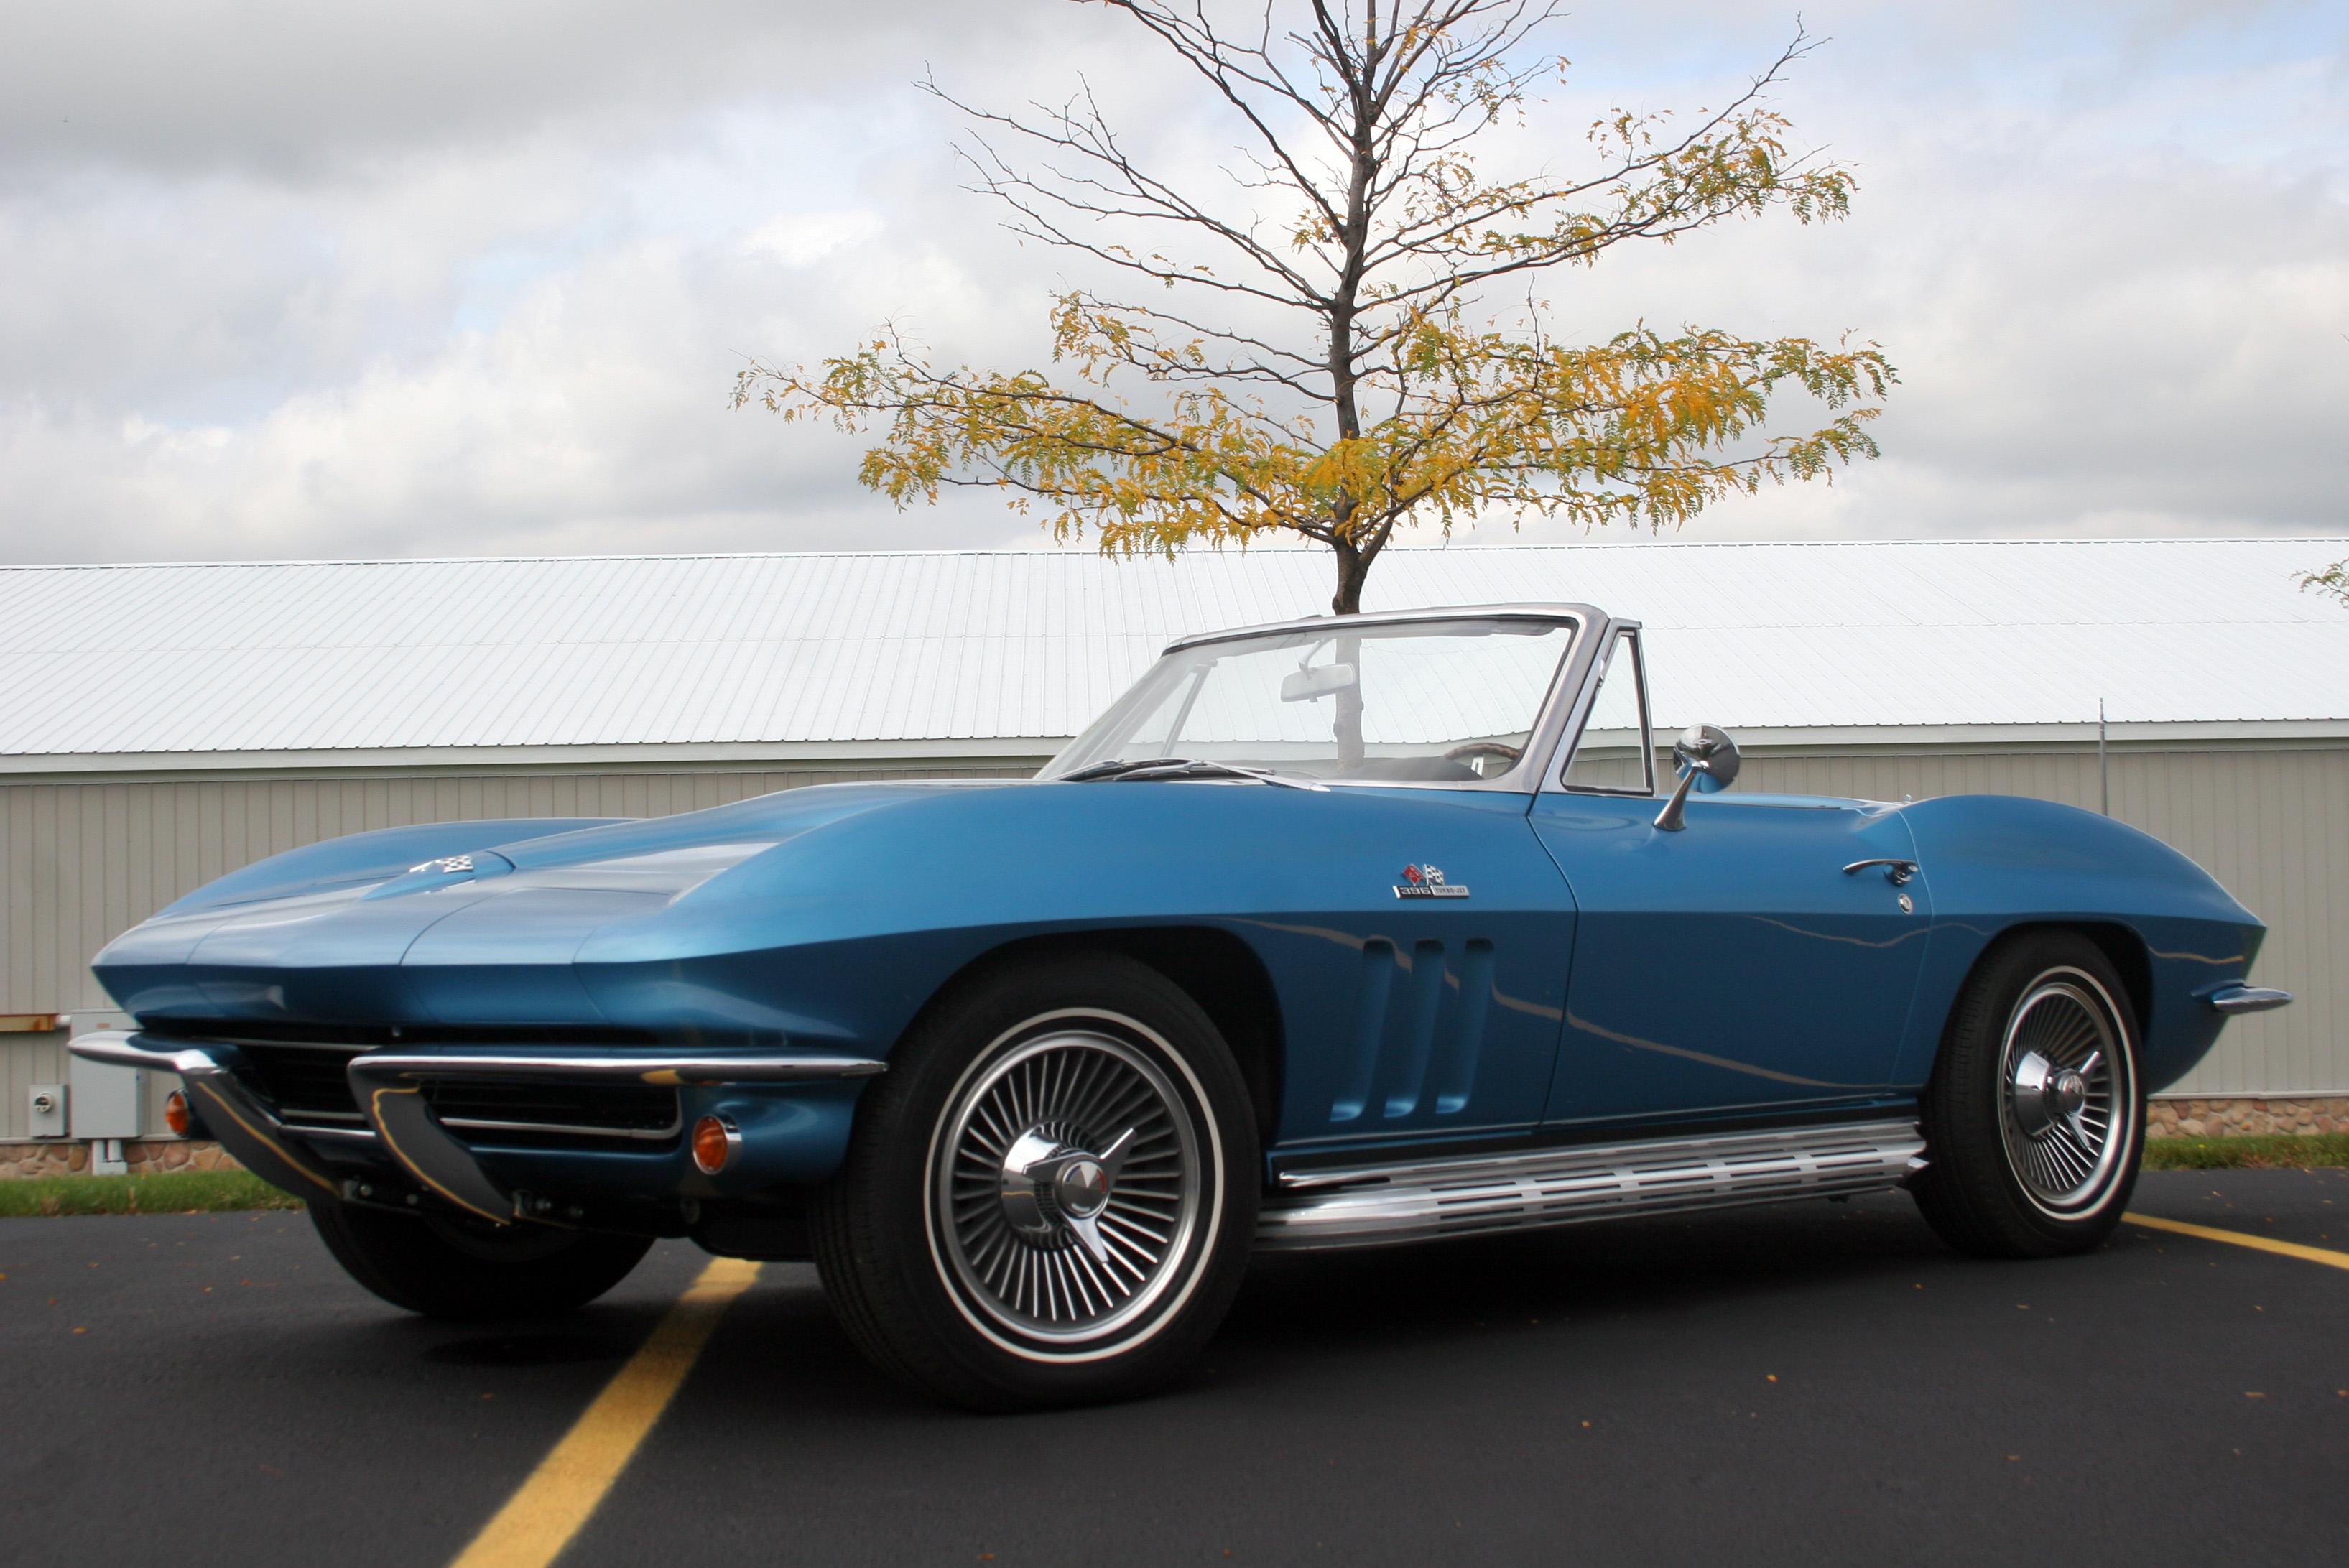 1965 corvette wallpaper - photo #3